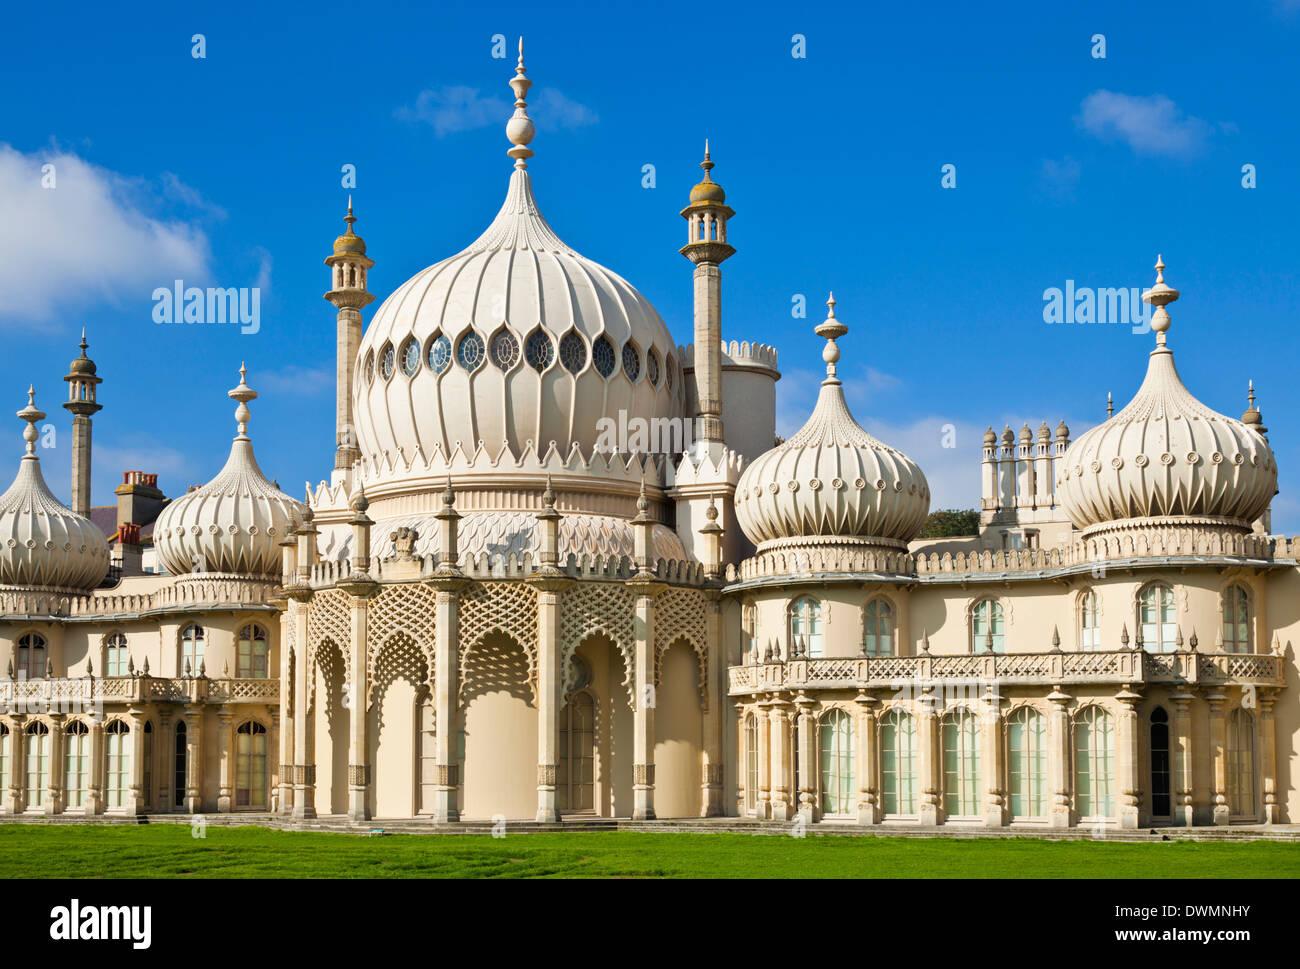 Brighton Royal Pavilion, Brighton, East Sussex, England, United Kingdom, Europe - Stock Image